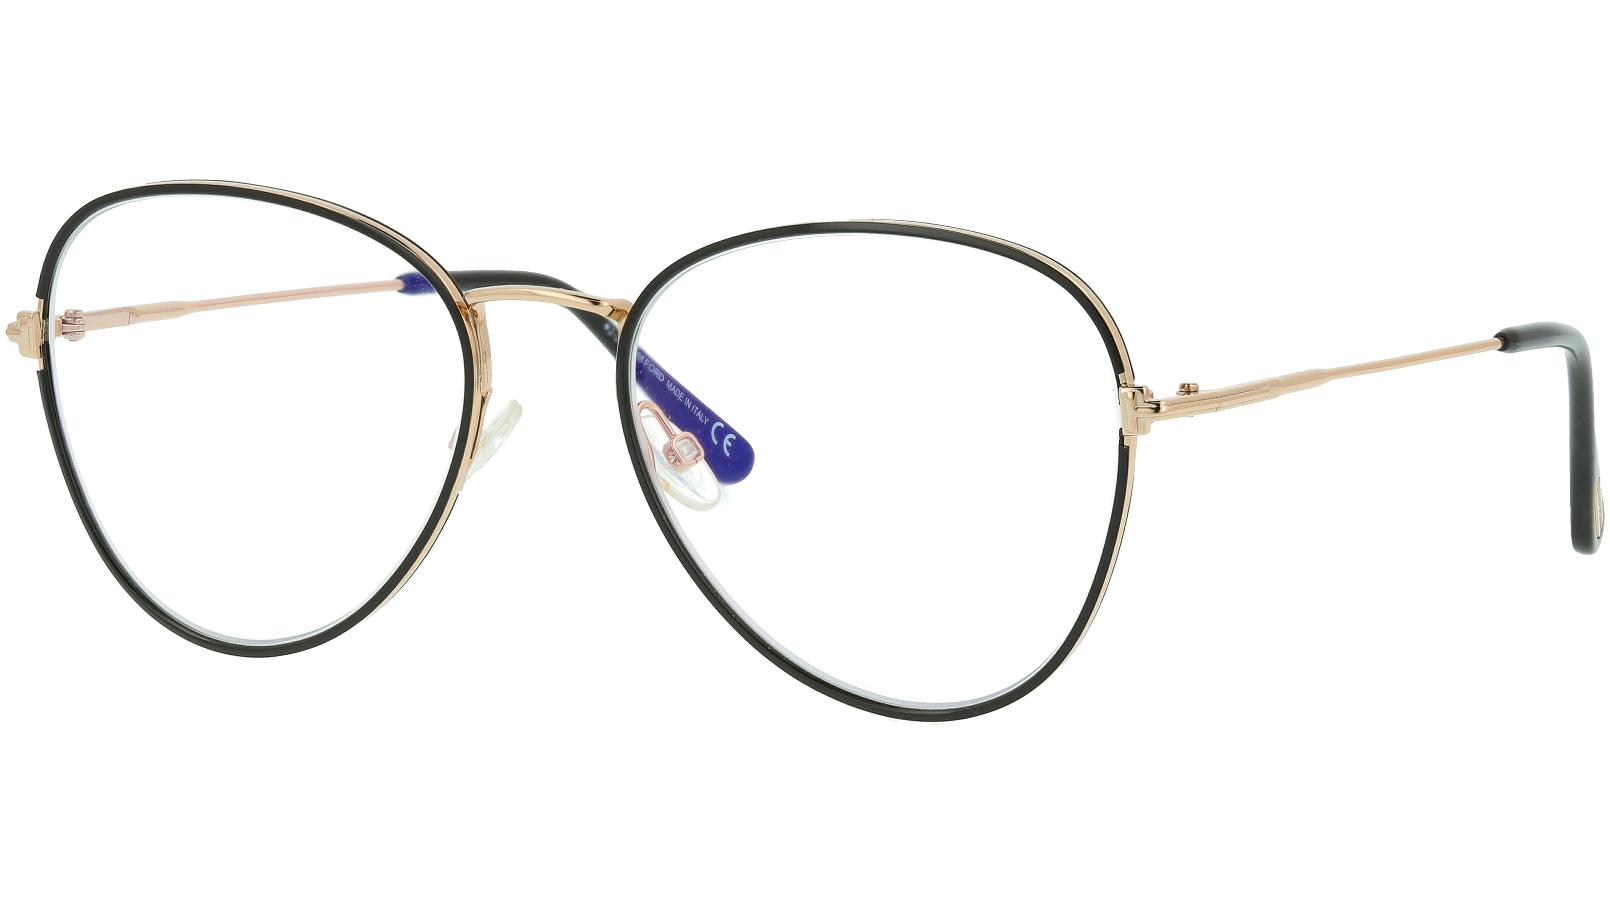 Tom Ford TF5631-B 001 54 Shiny Glasses